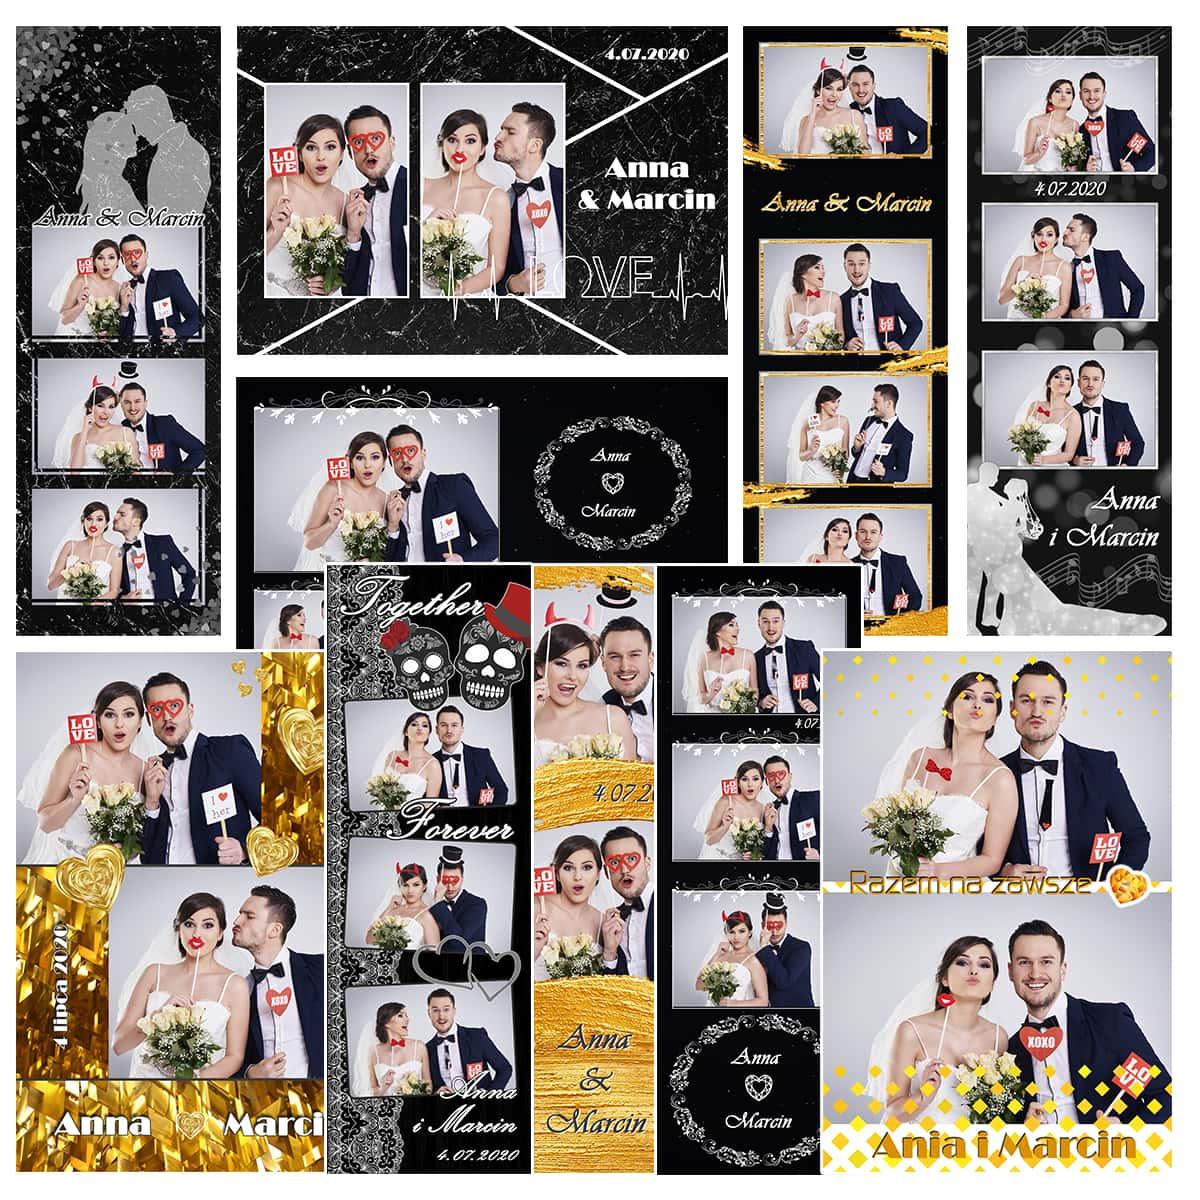 szablony fotobudkowe weselne 2020